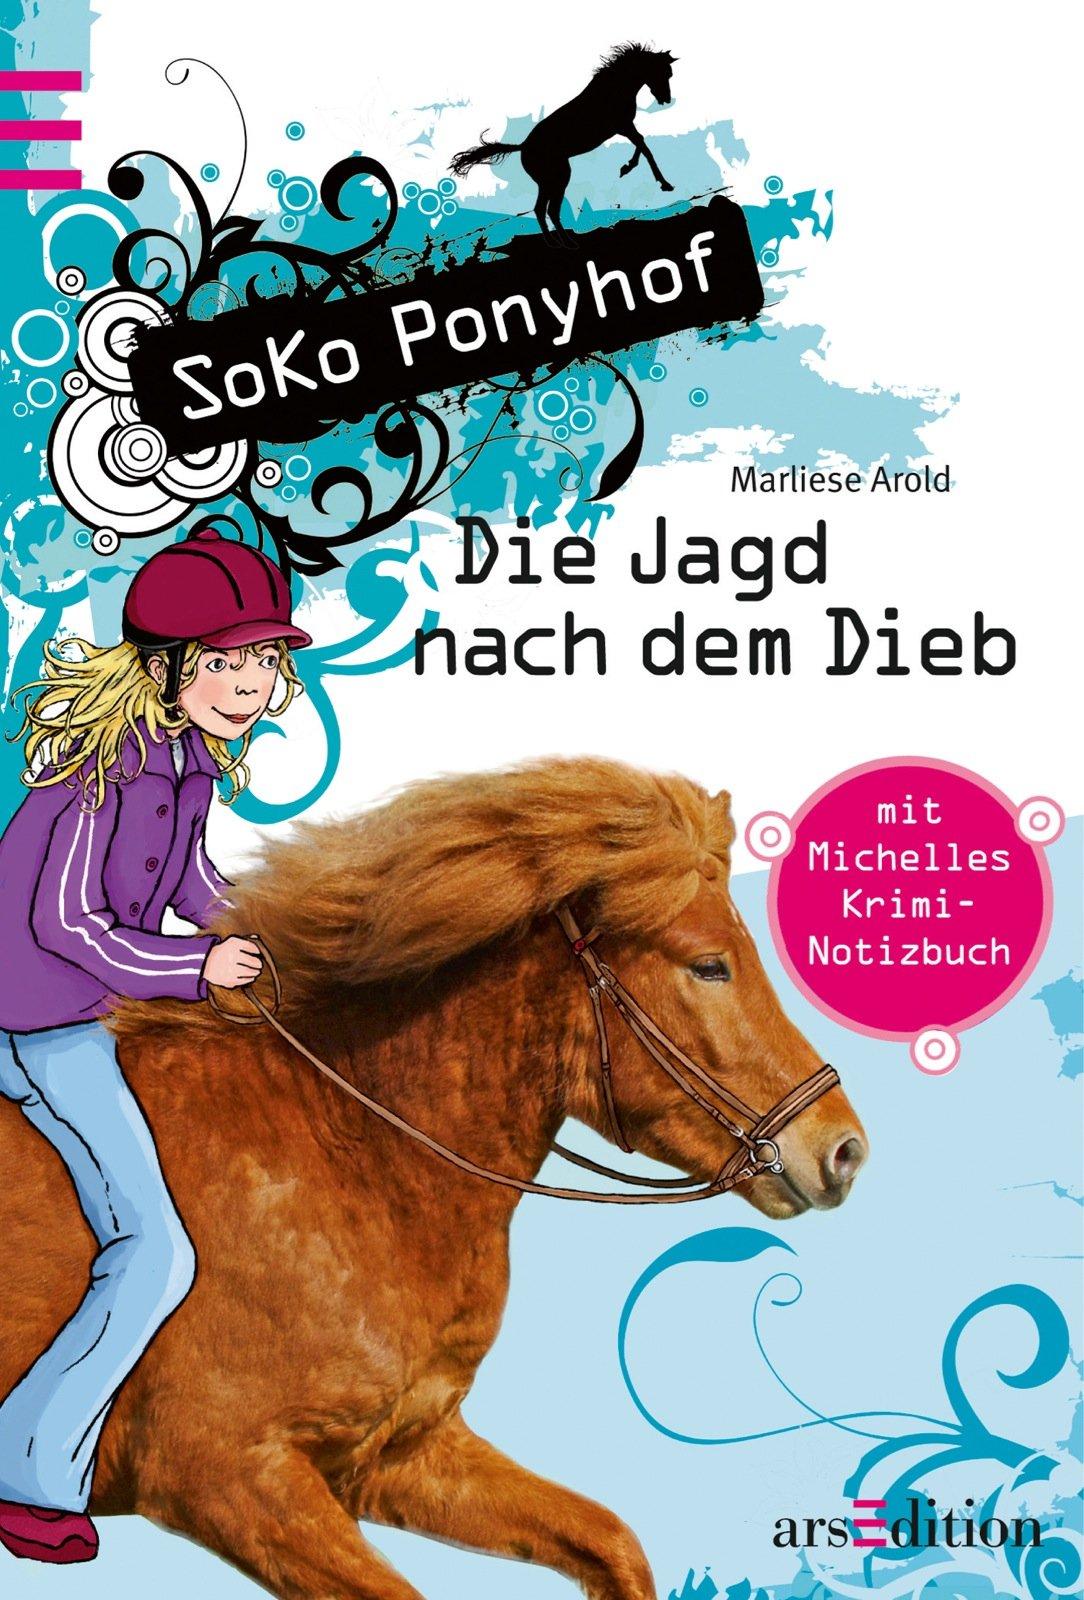 SOKO Ponyhof - Jagd nach dem Dieb